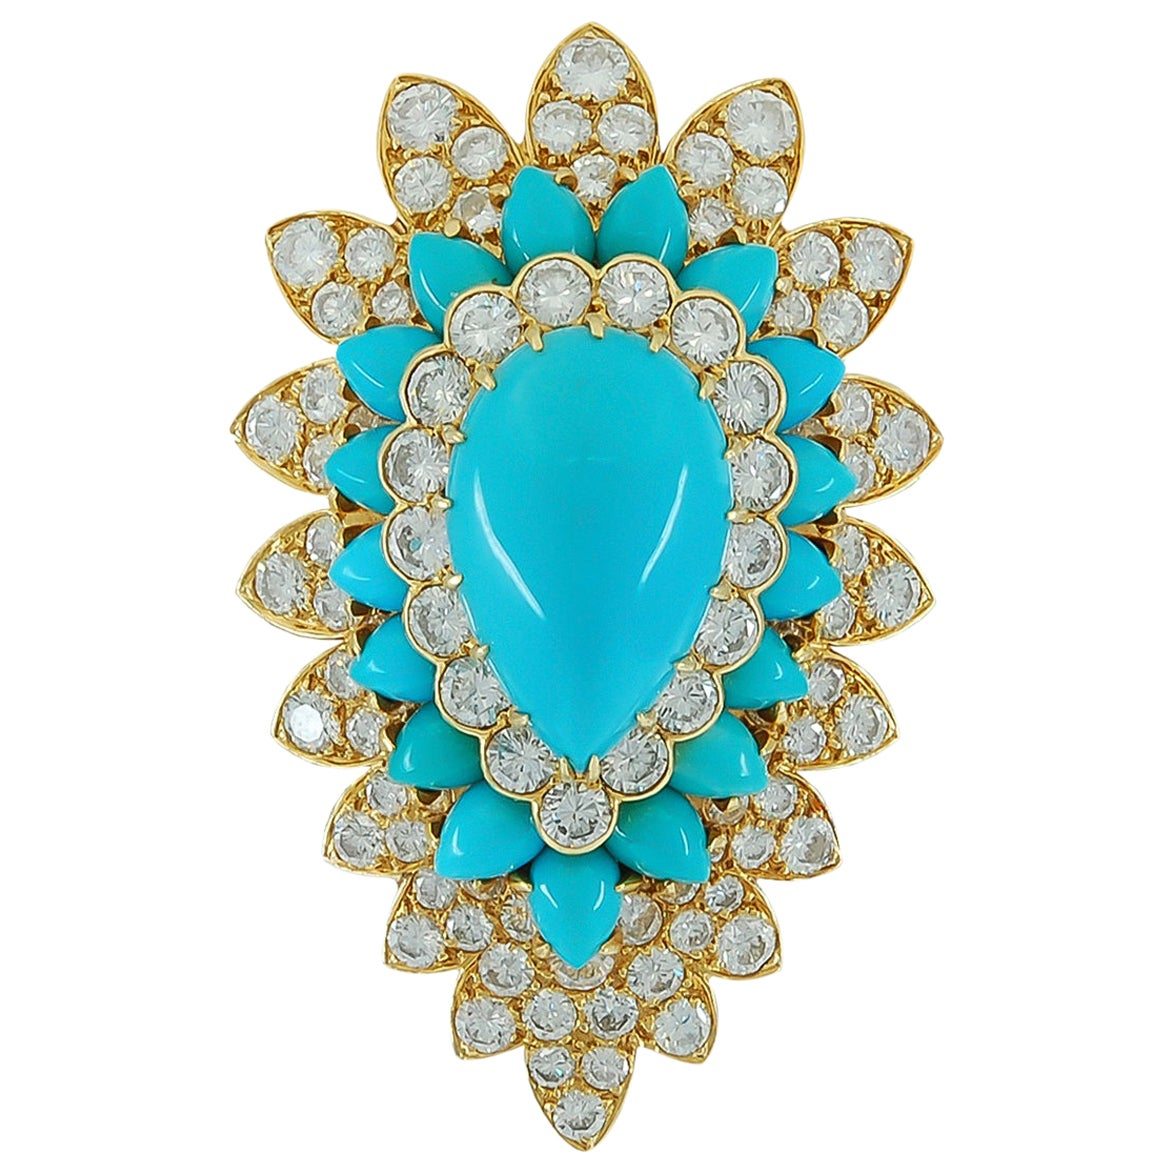 Van Cleef & Arpels Diamond Turquoise Yellow Gold Brooch